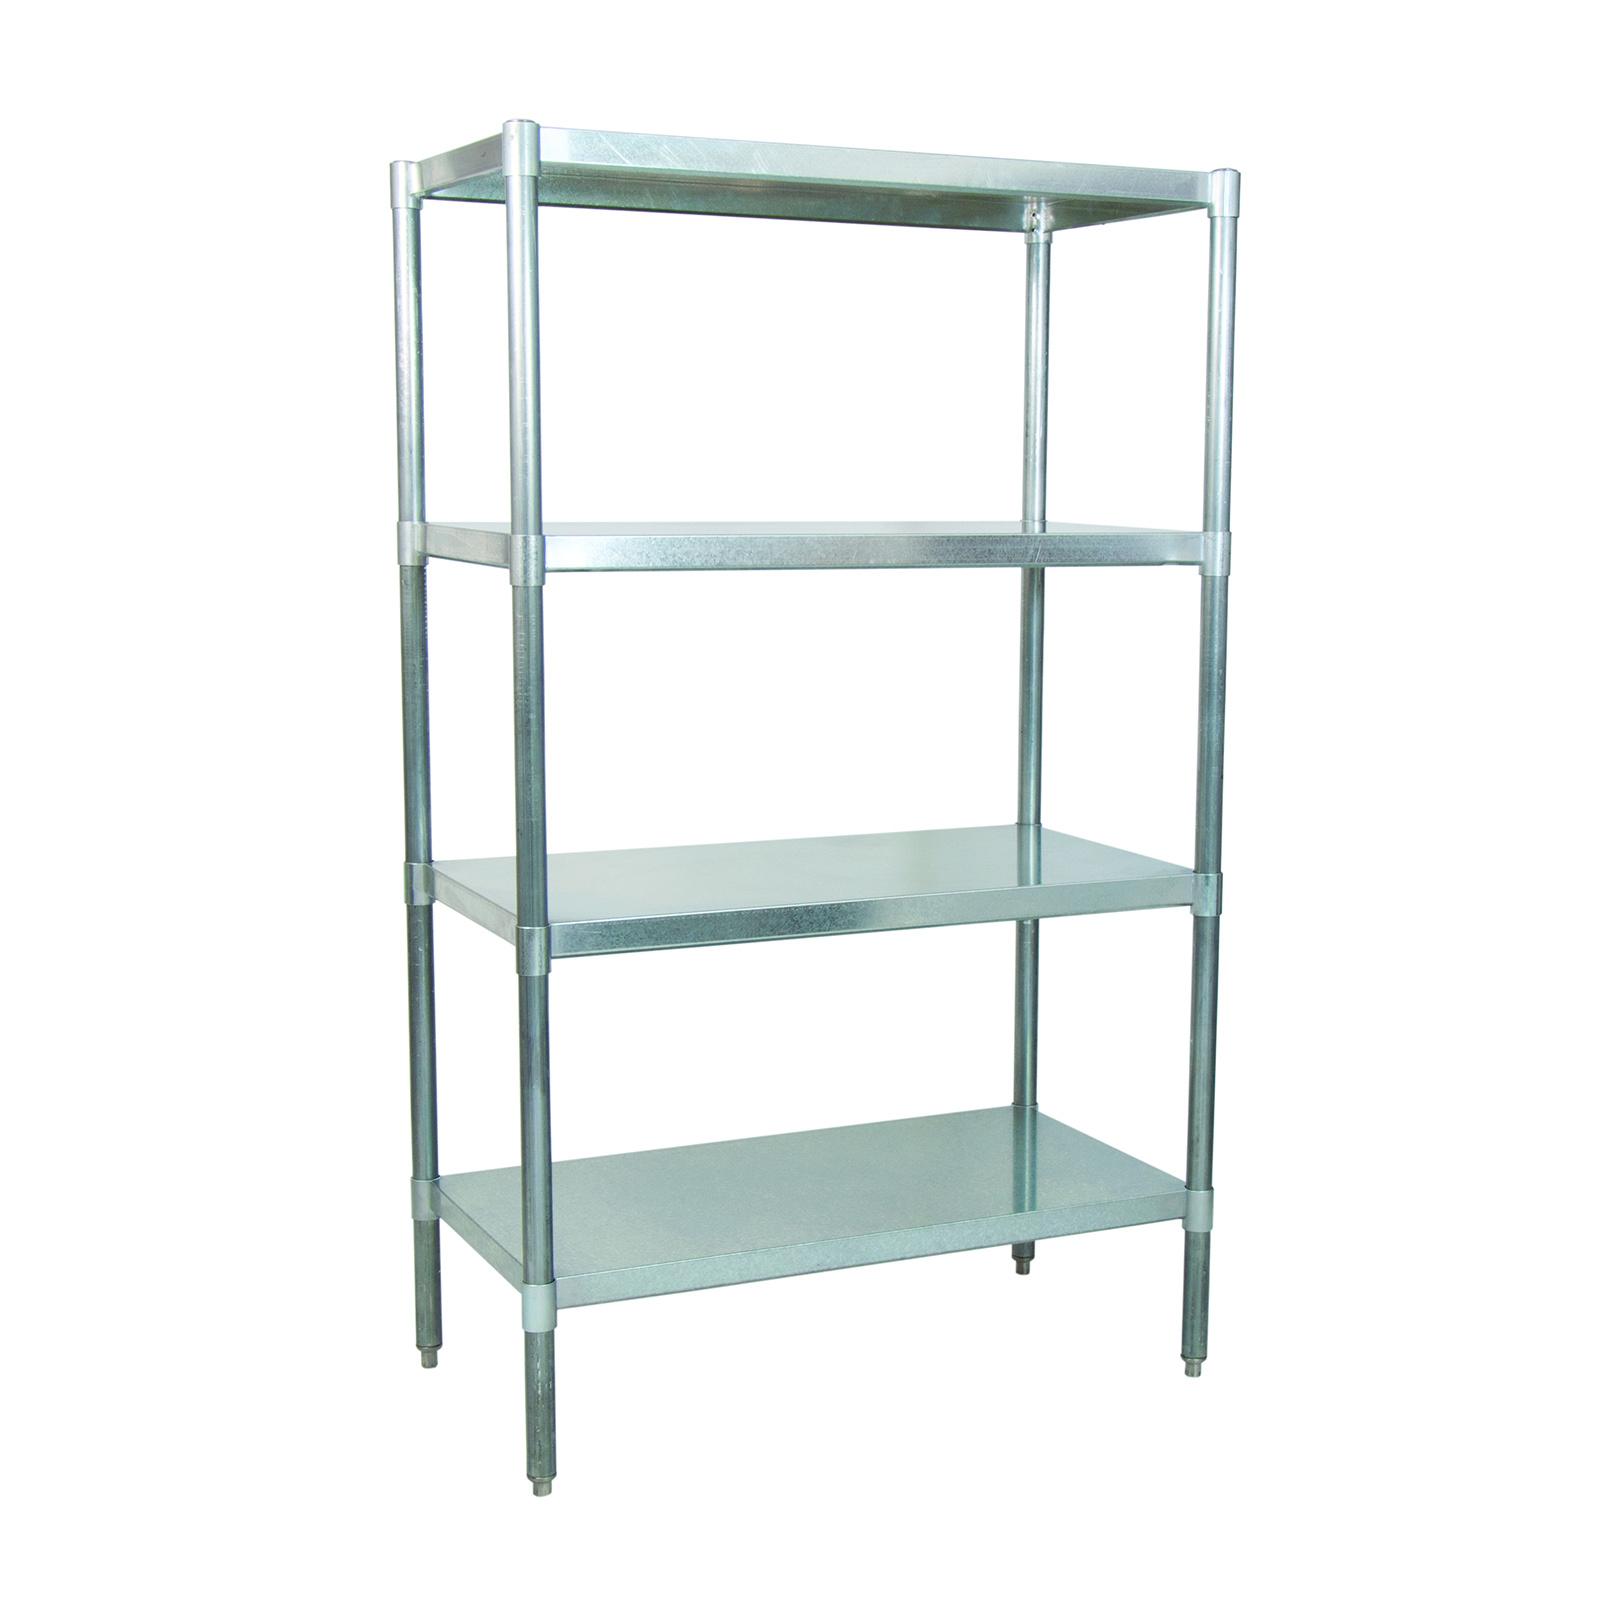 BK Resources VSU6-5524 shelving unit, solid flat